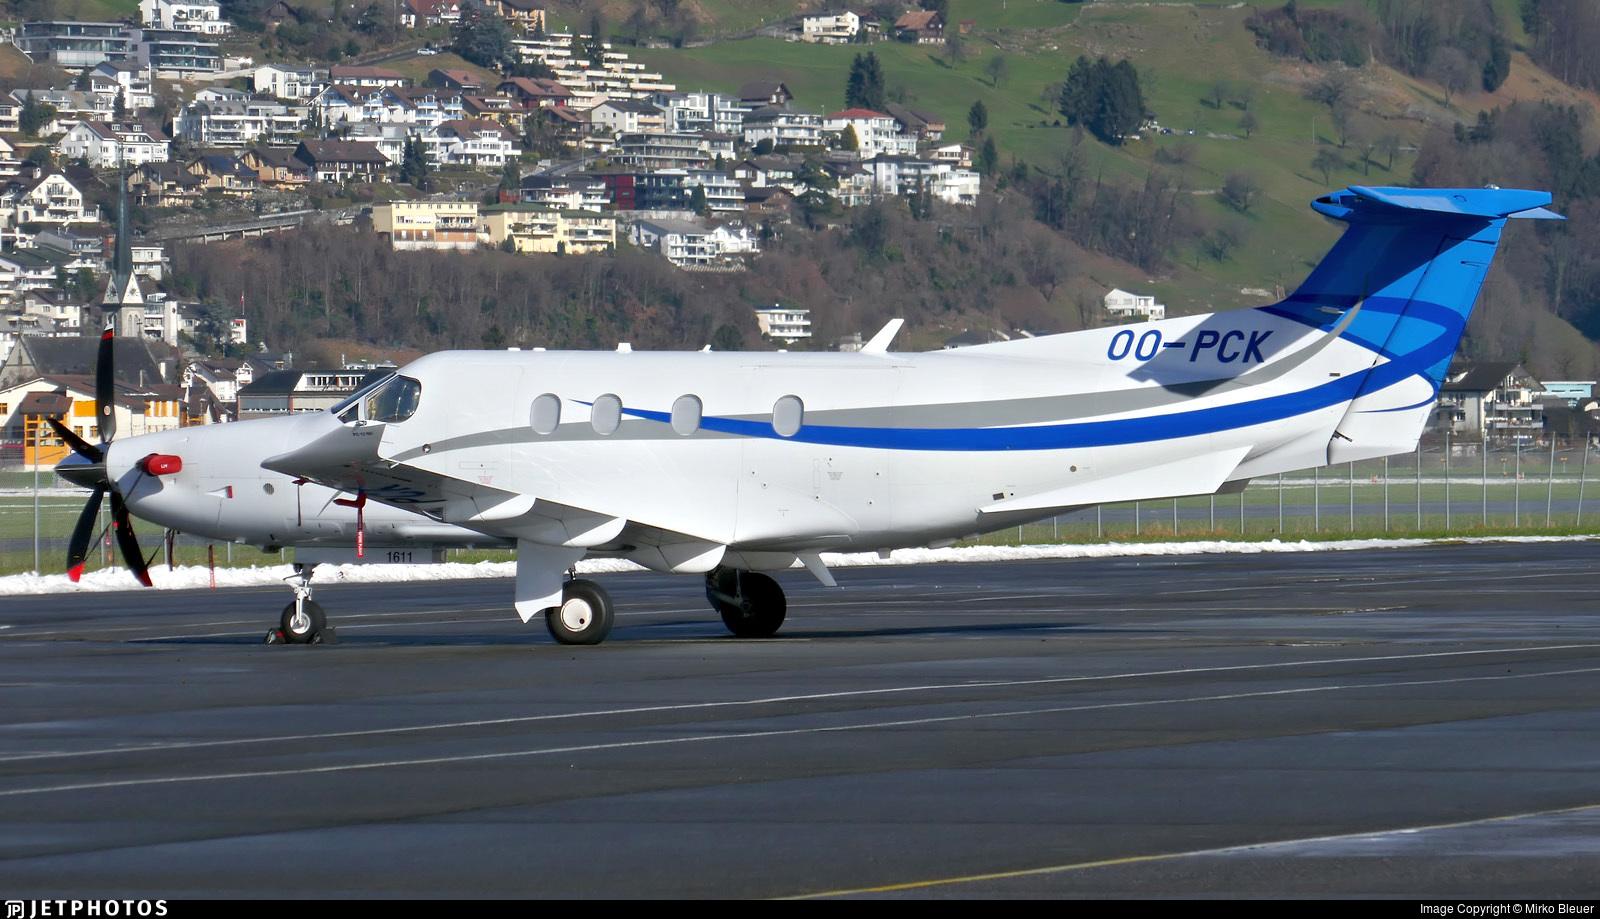 OO-PCK - Pilatus PC-12/47E - European Aircraft Private Club (EAPC)